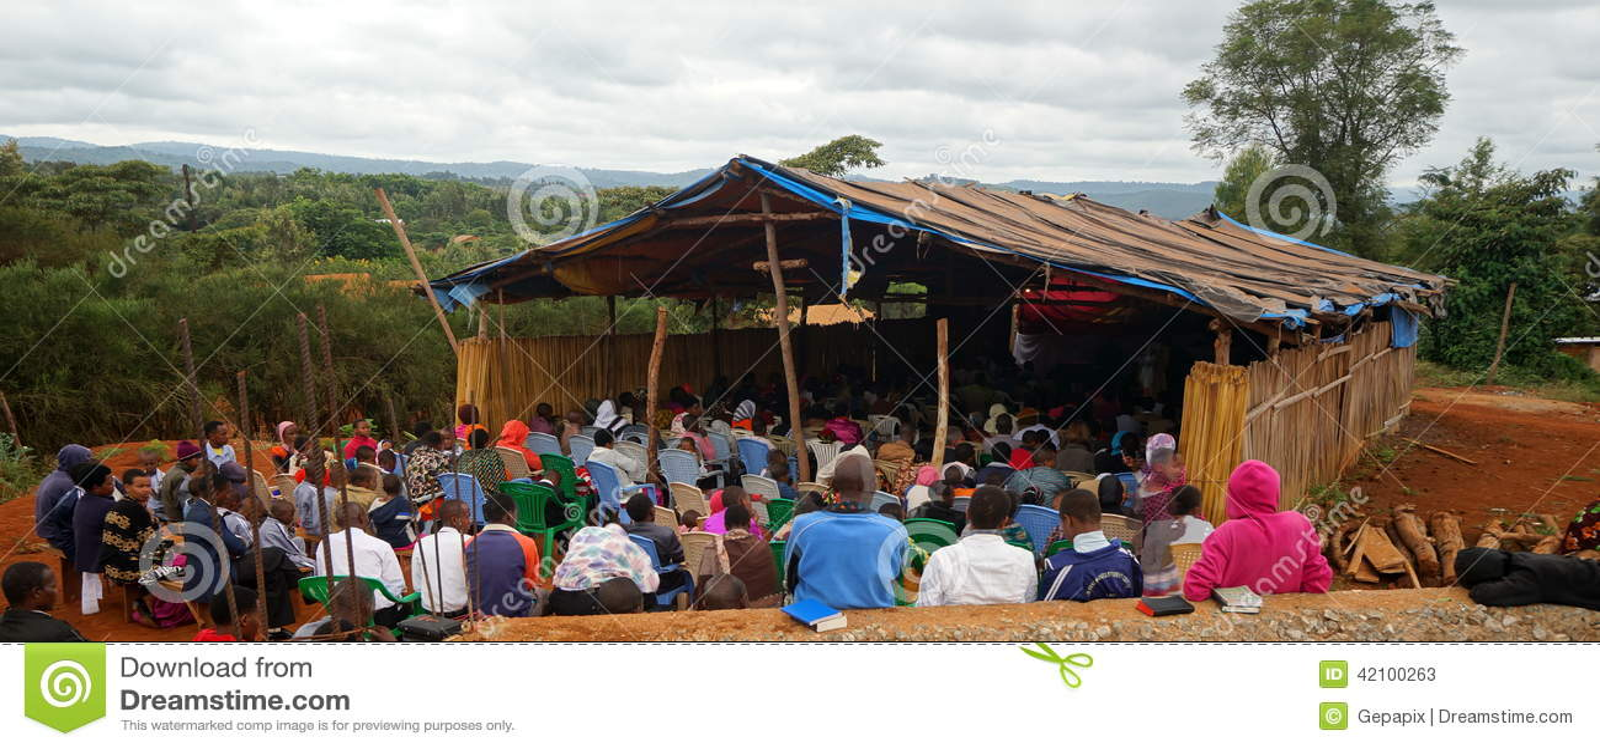 Igreja protestante em Tanzânia